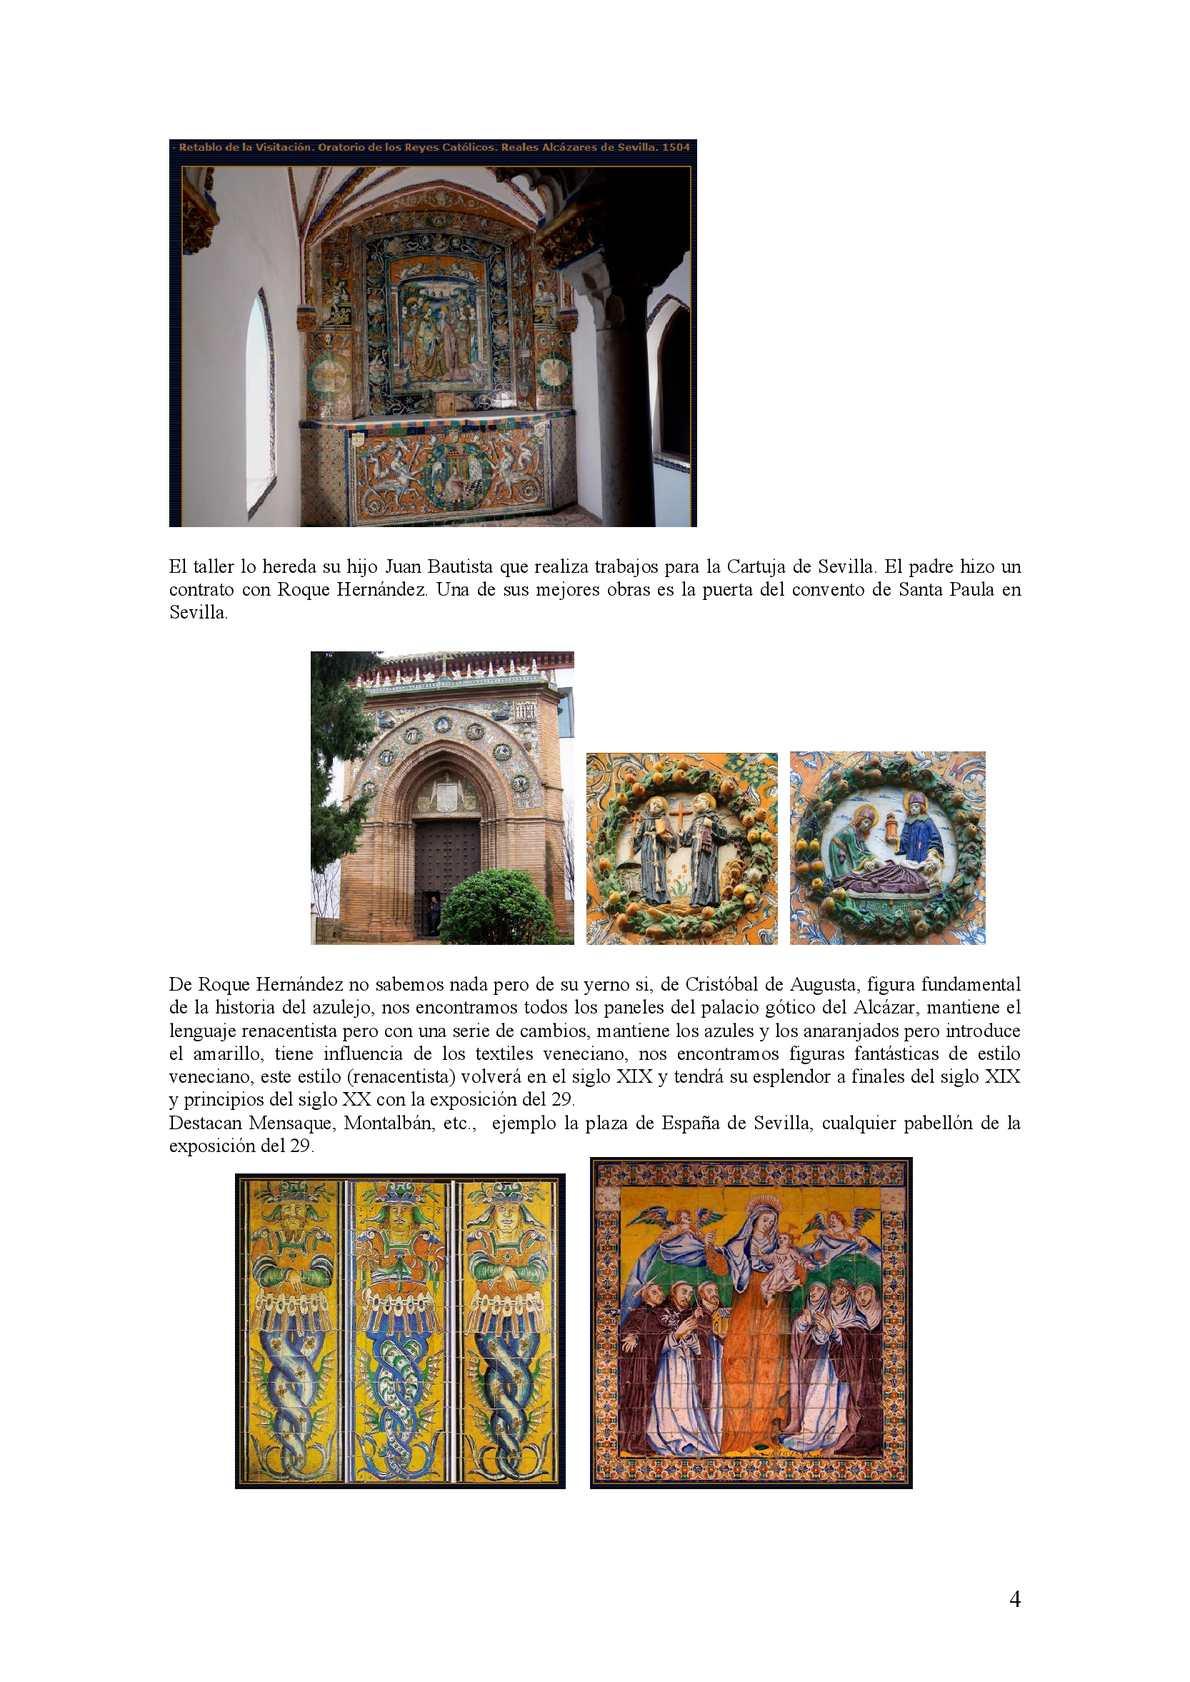 Historia De La Cer Mica Calameo Downloader # Muebles Toscano Cordoba